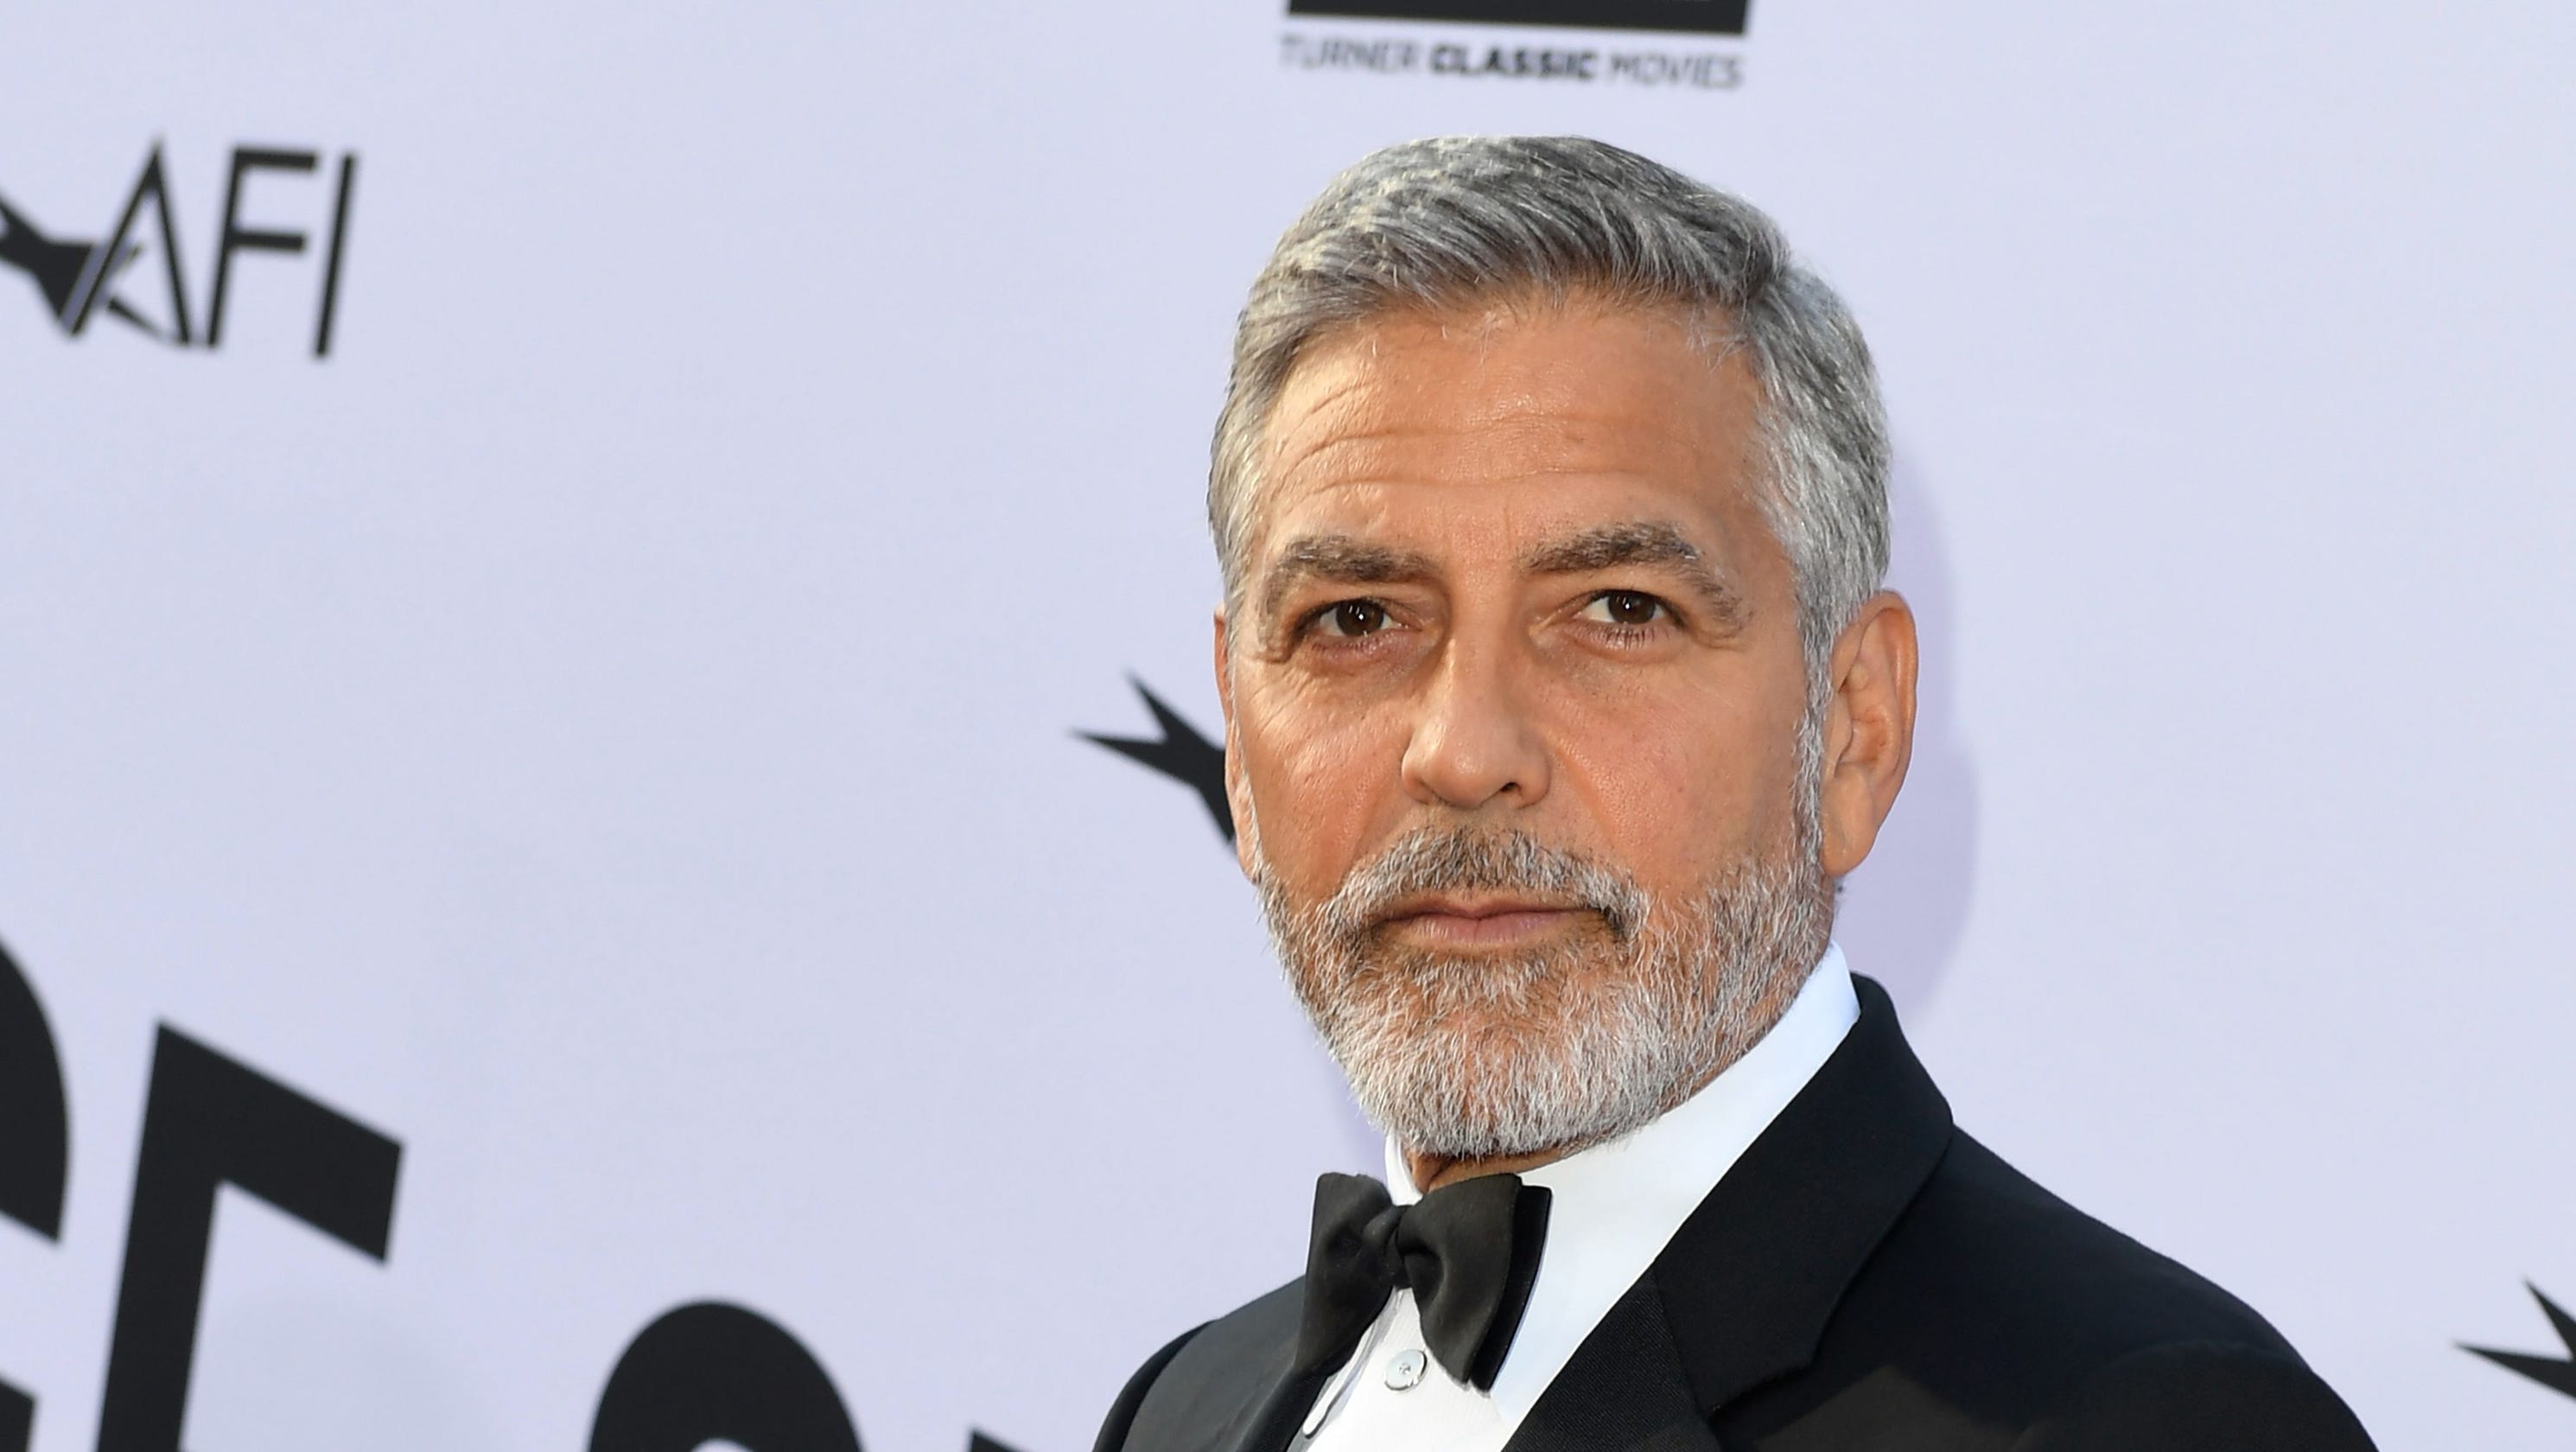 George Clooney, Dwayne Johnson top Forbes highest-paid actors list